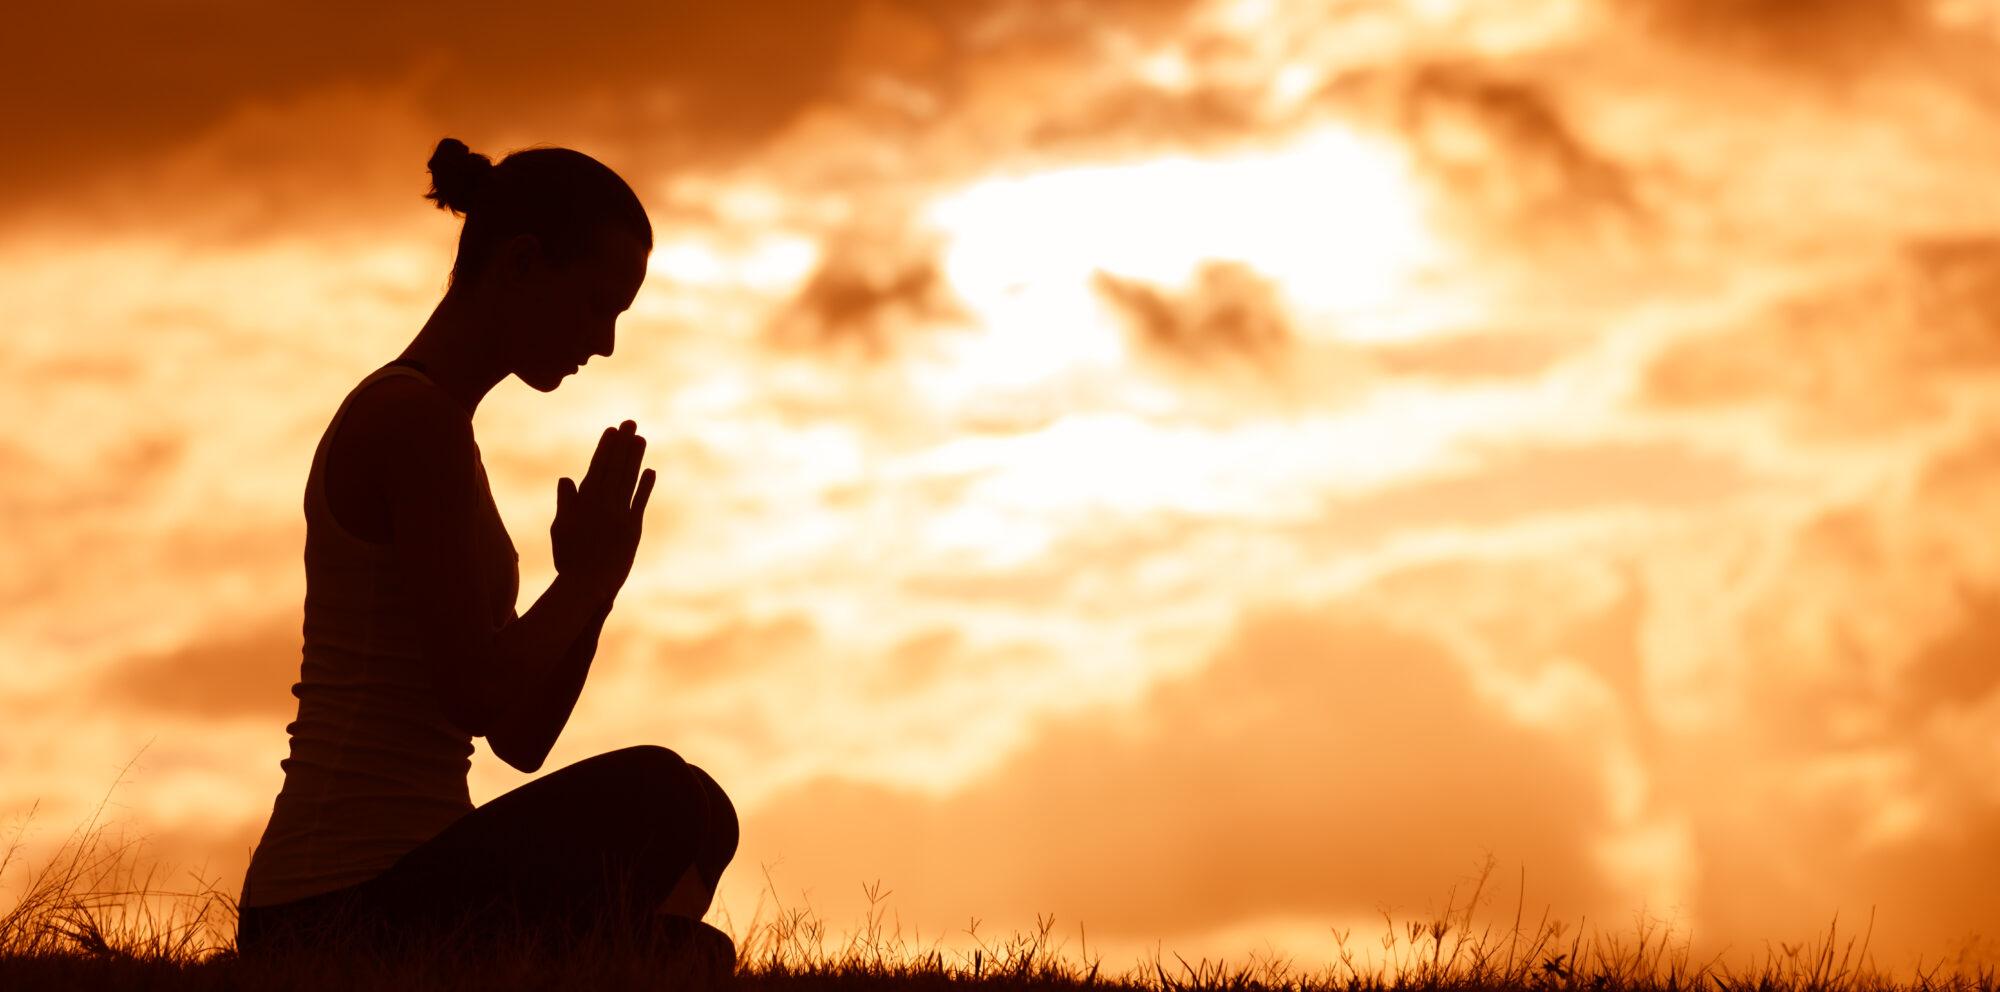 Silhouette of woman praying.